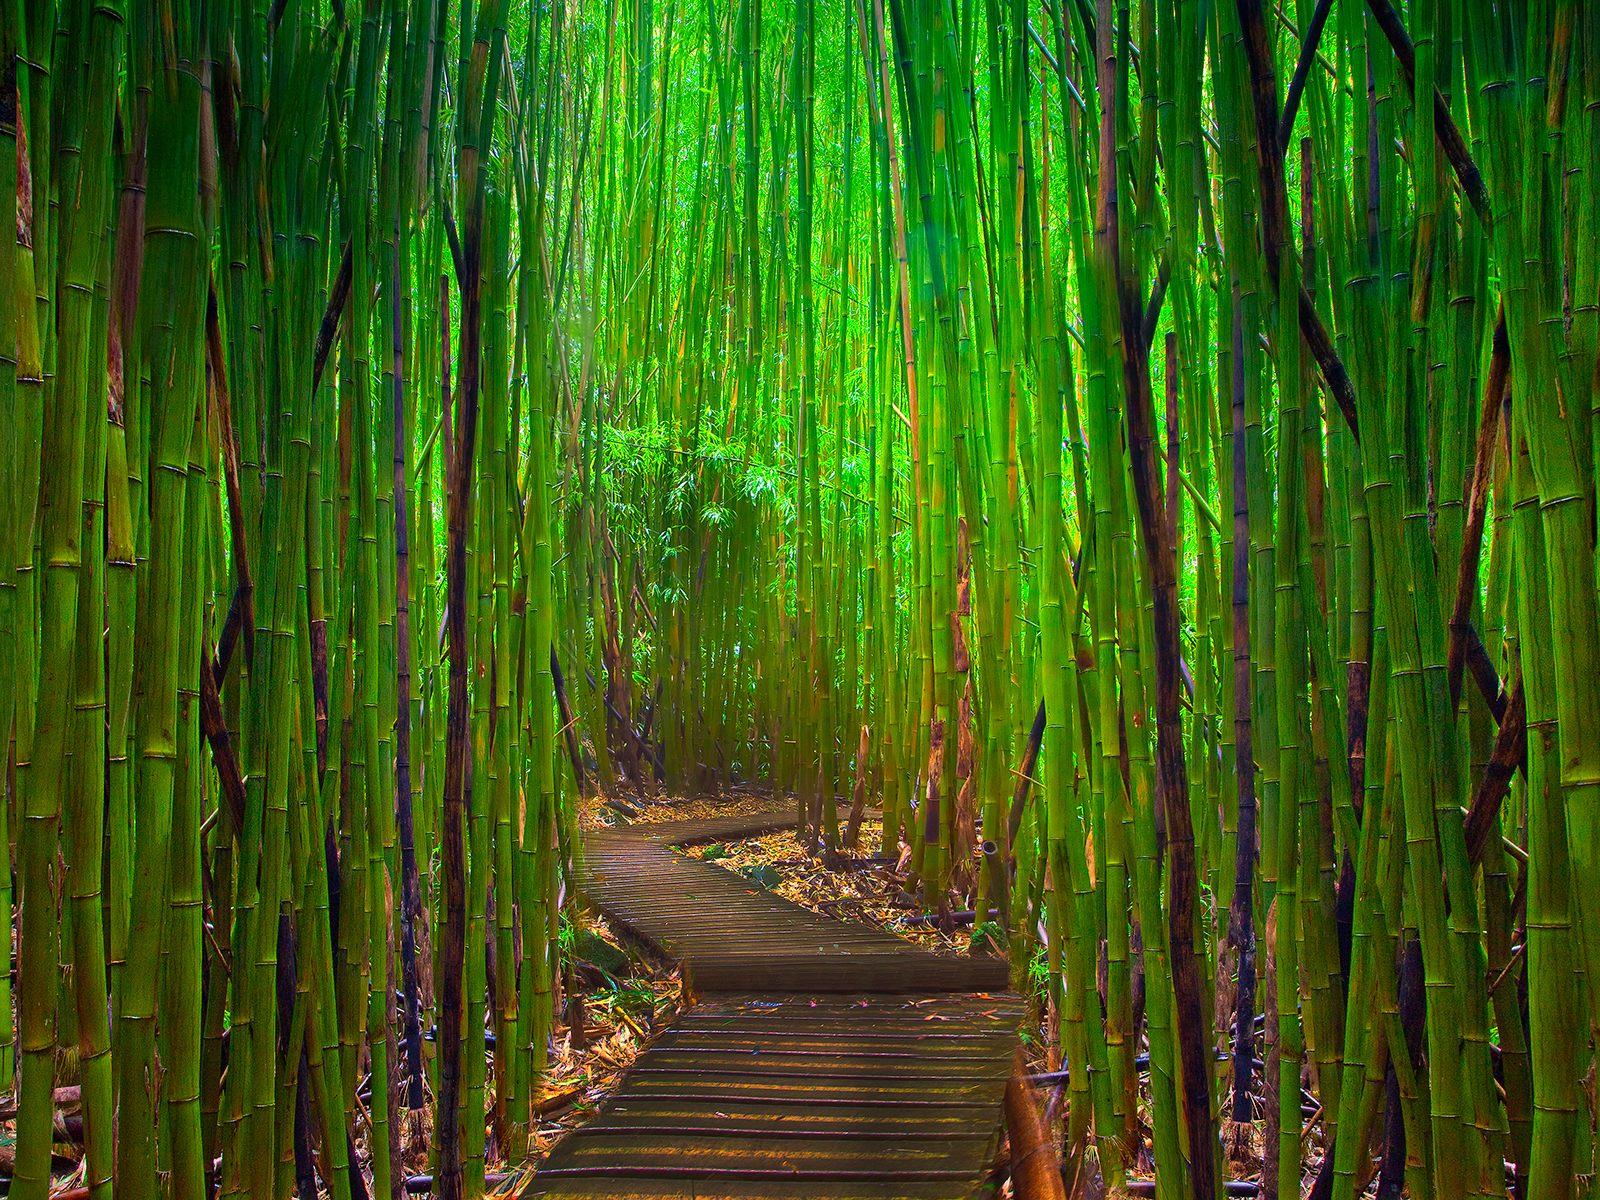 Bamboo Wallpaper Border 1600x1200